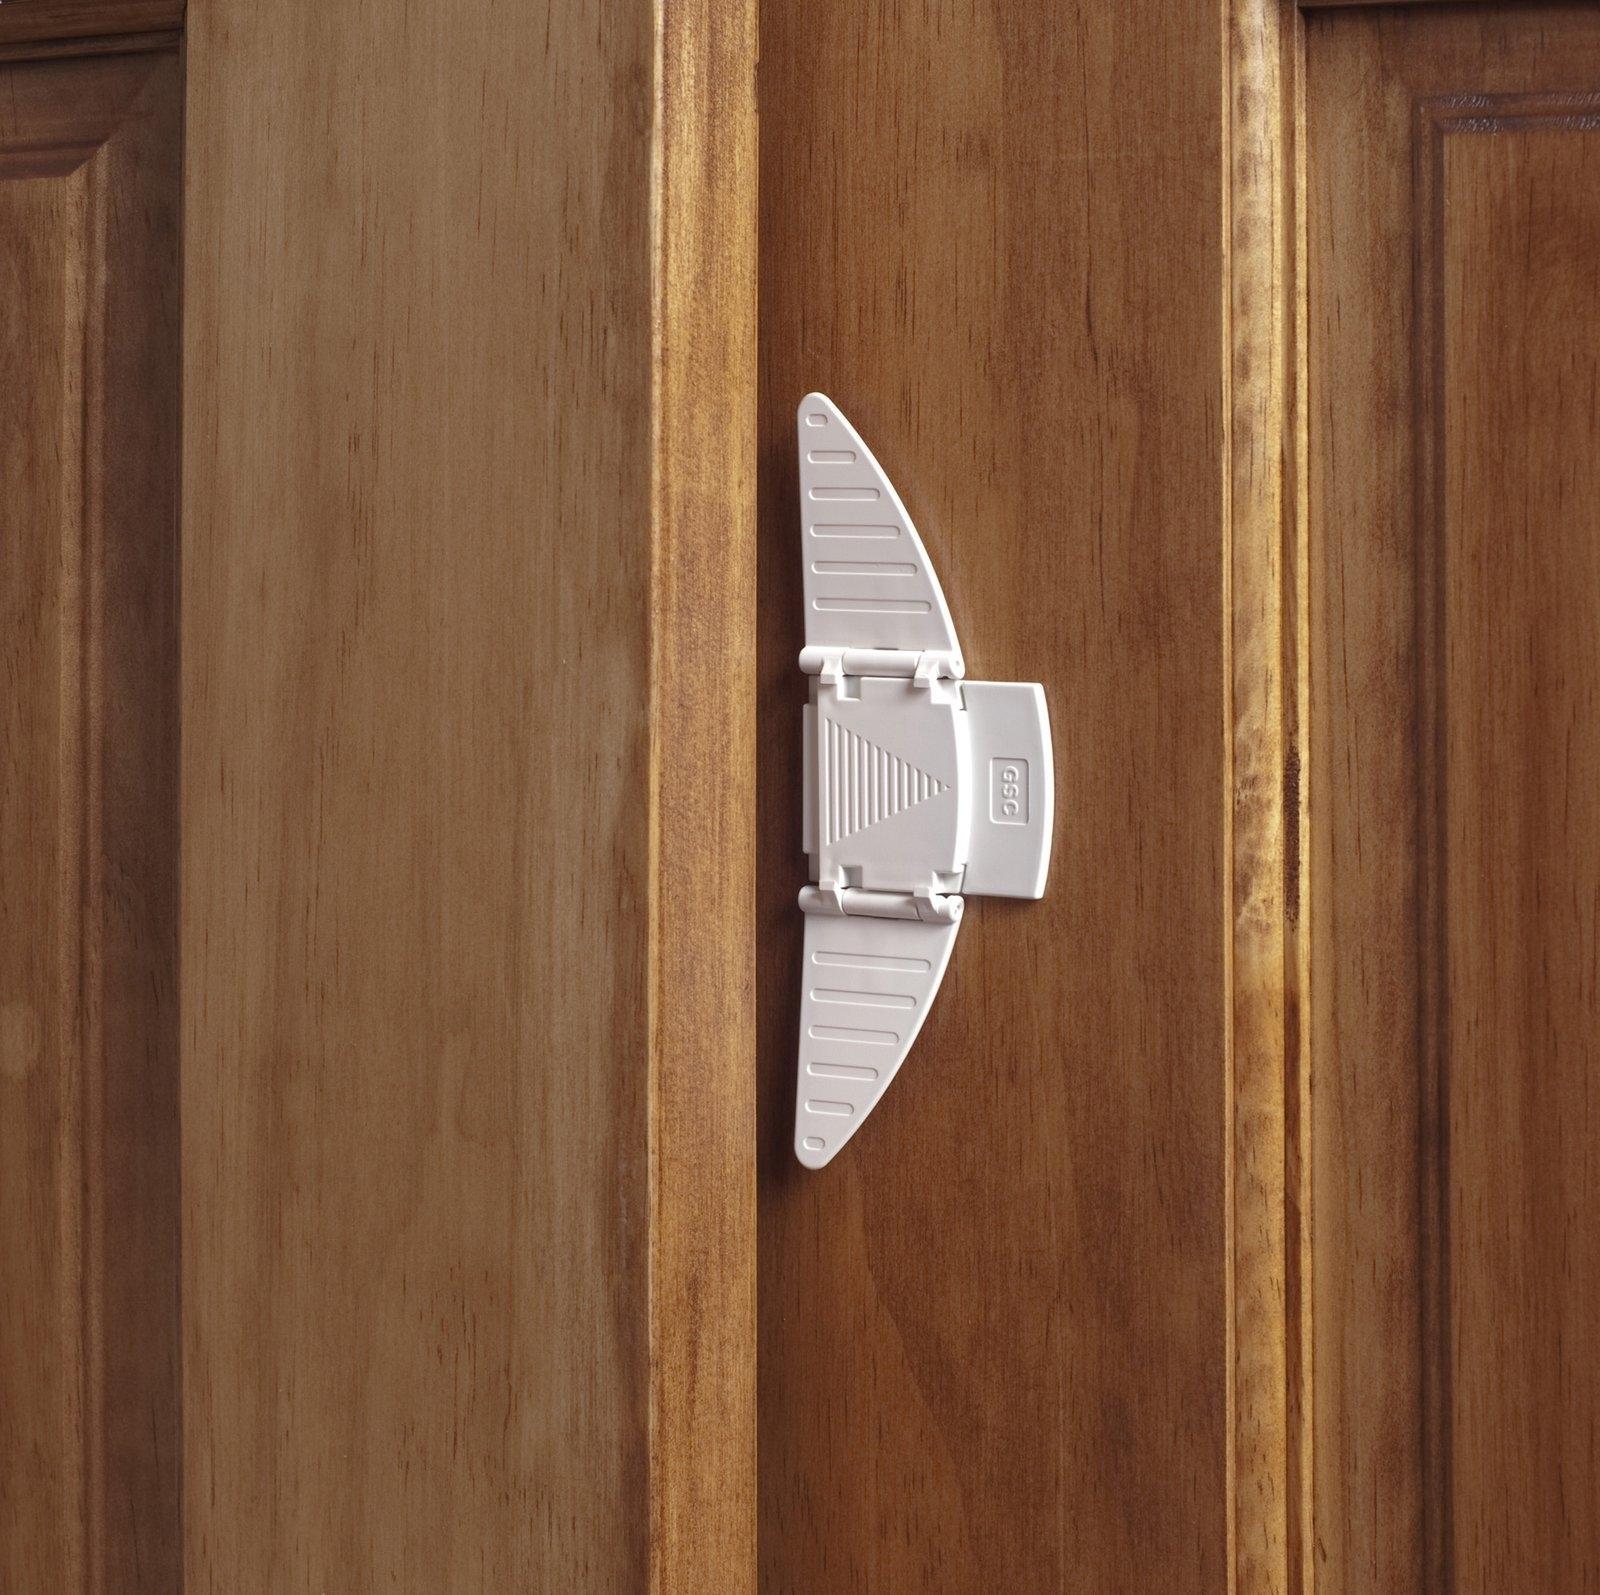 Safety Latch For Sliding Closet Doorsafety latch for sliding closet door